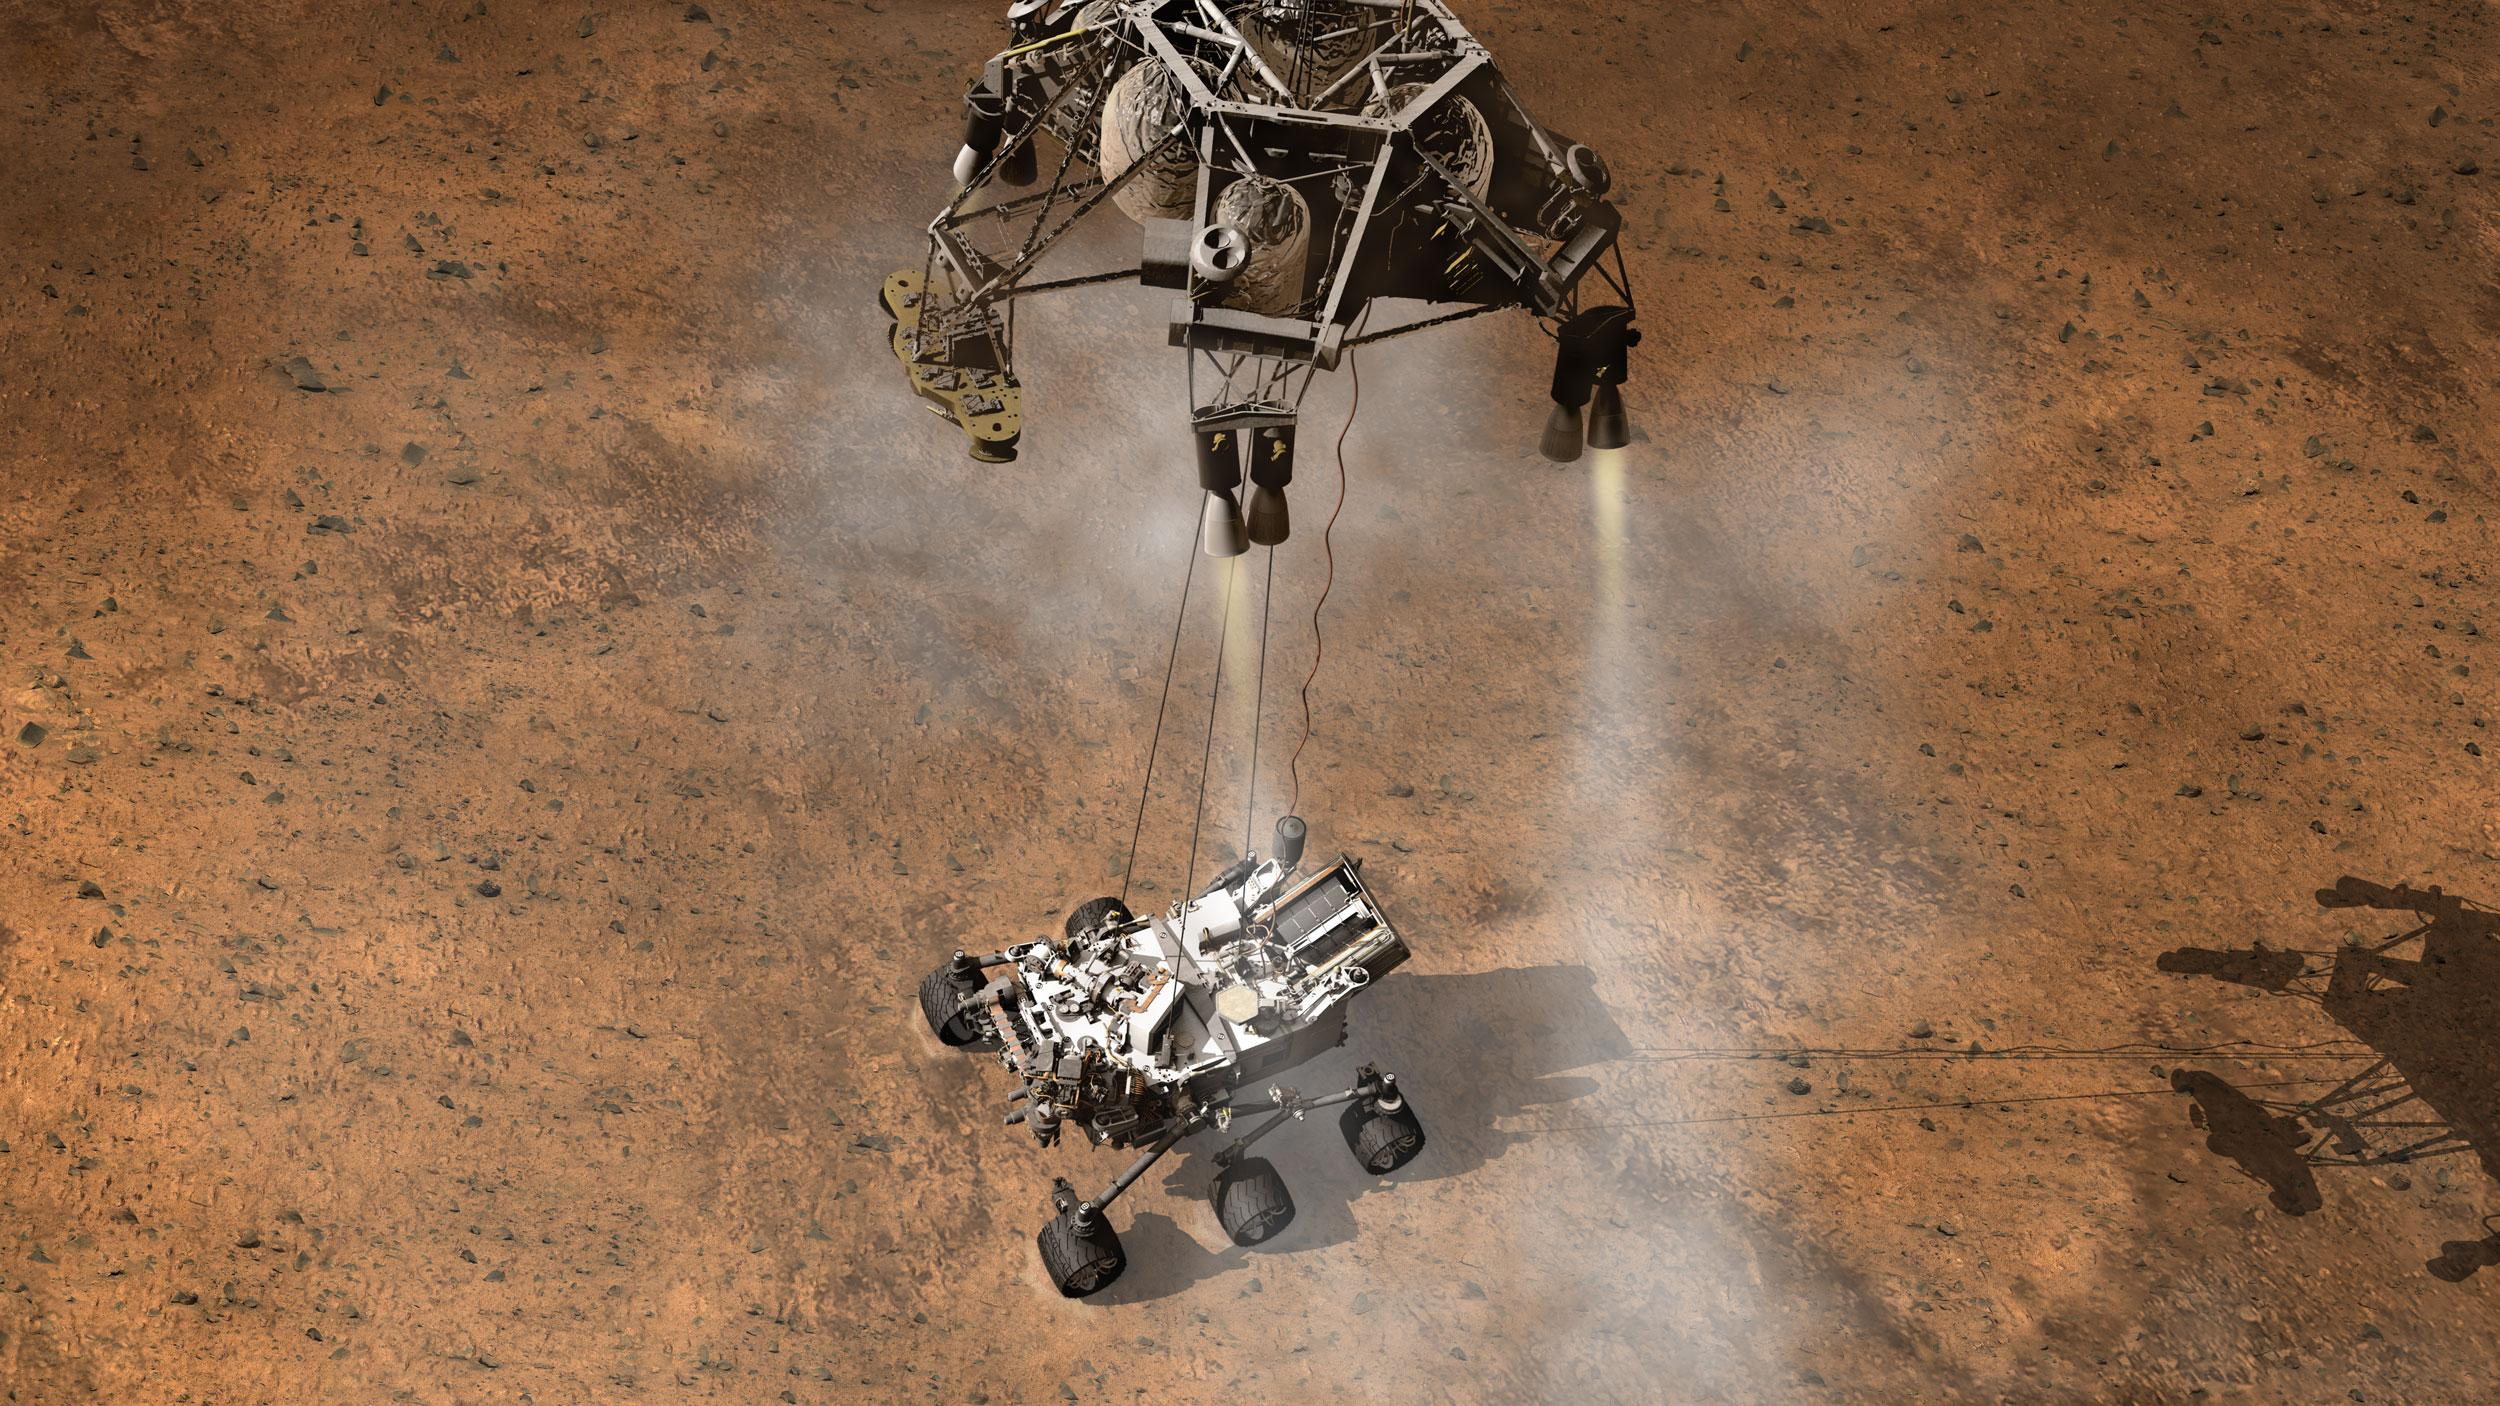 nasa curiosity landing - HD1500×800